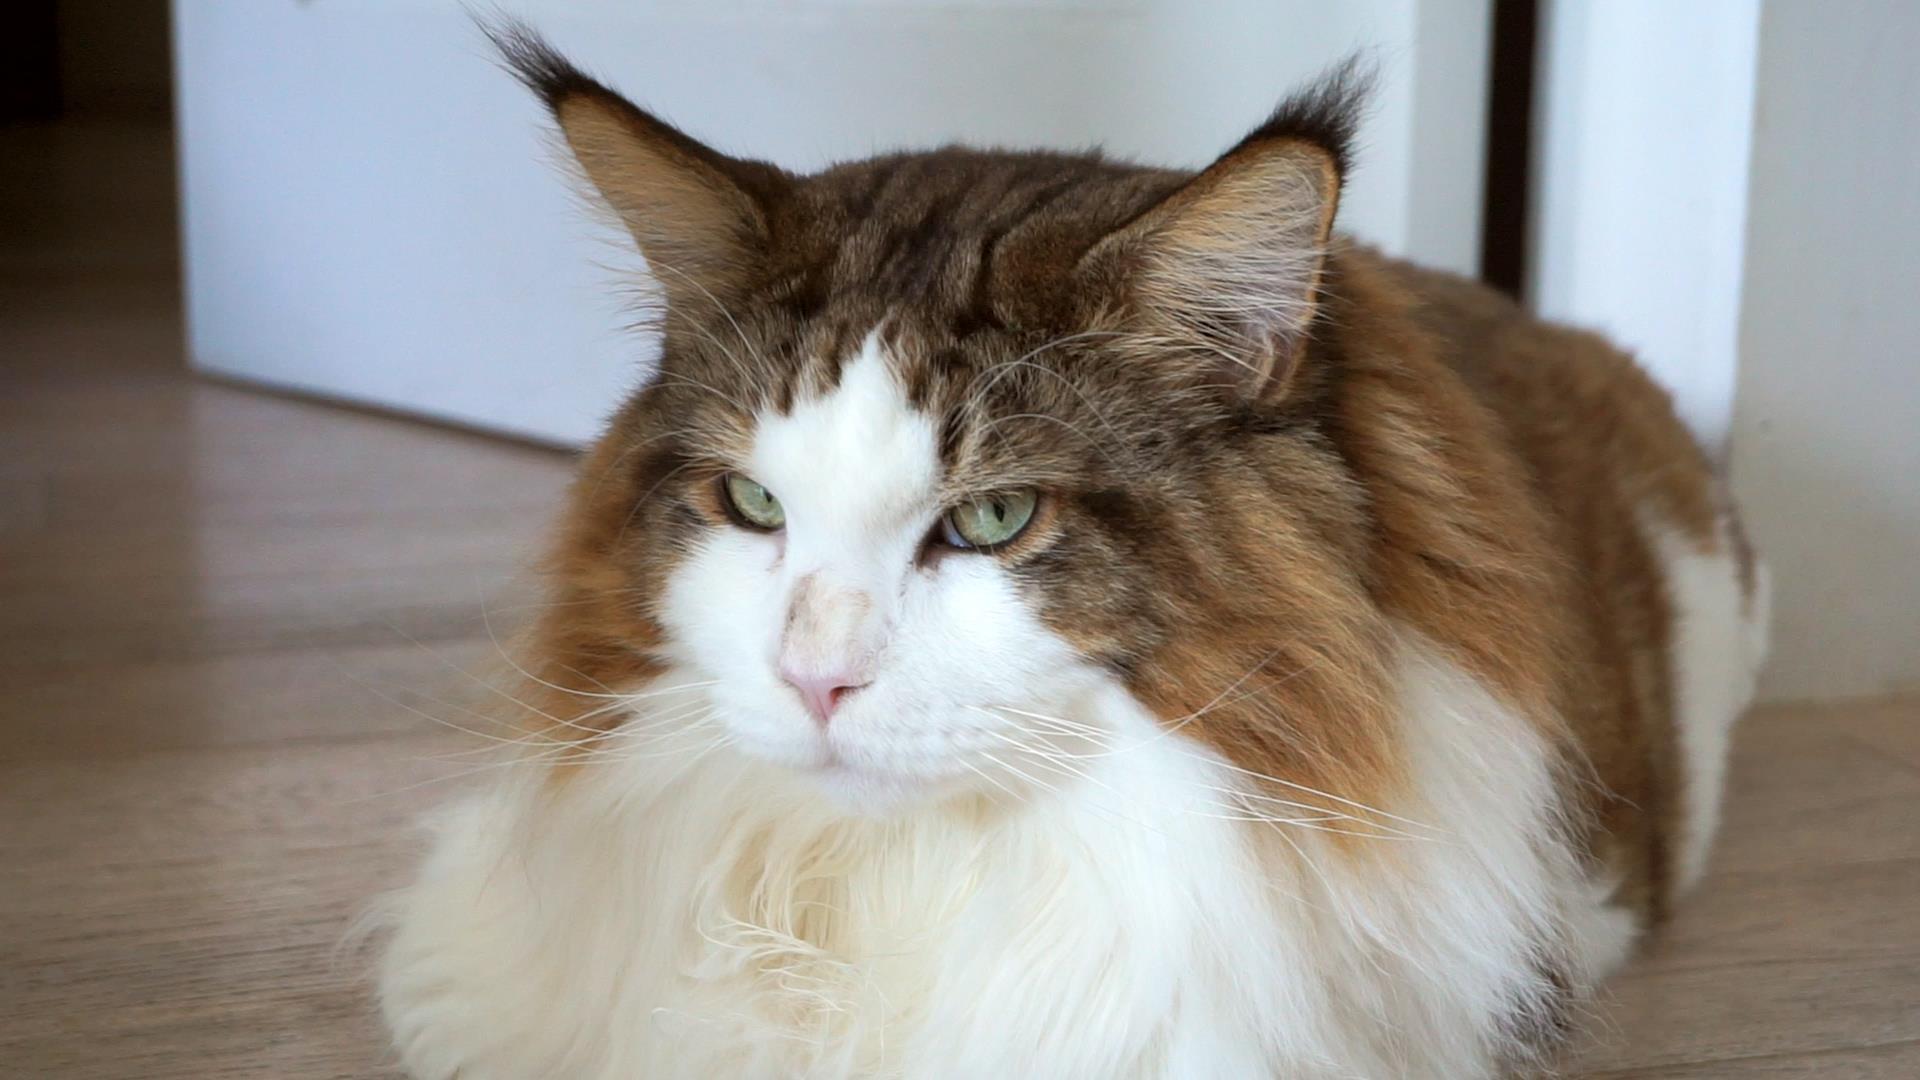 New Yorks biggest cat, Samson, takes internet by storm